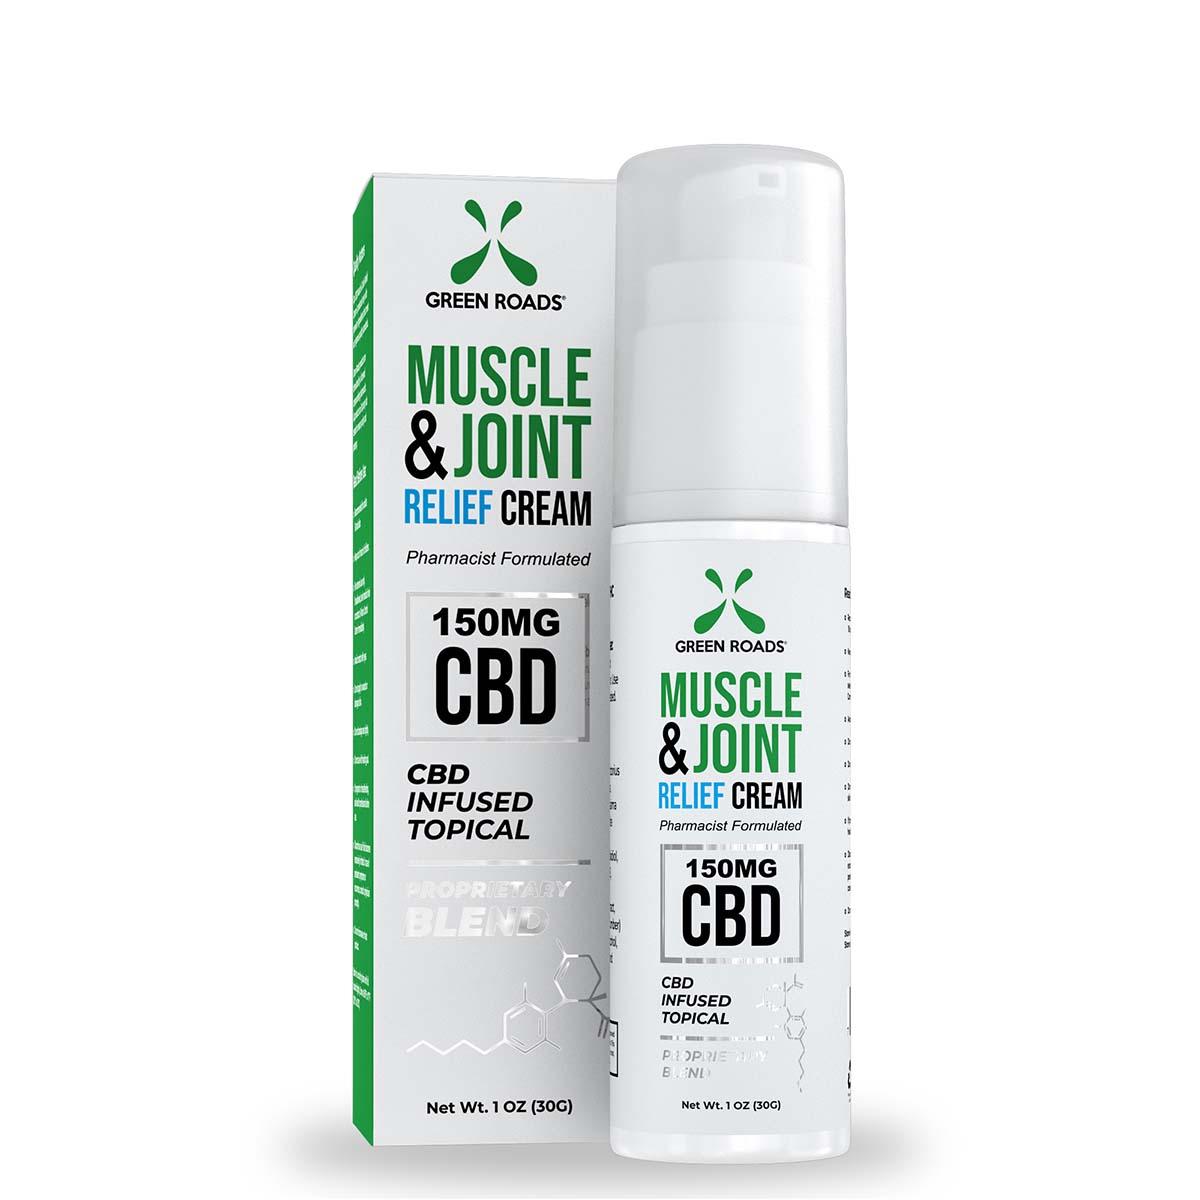 Soothing CBD Topical Cream – 150mg Green Roads CBD